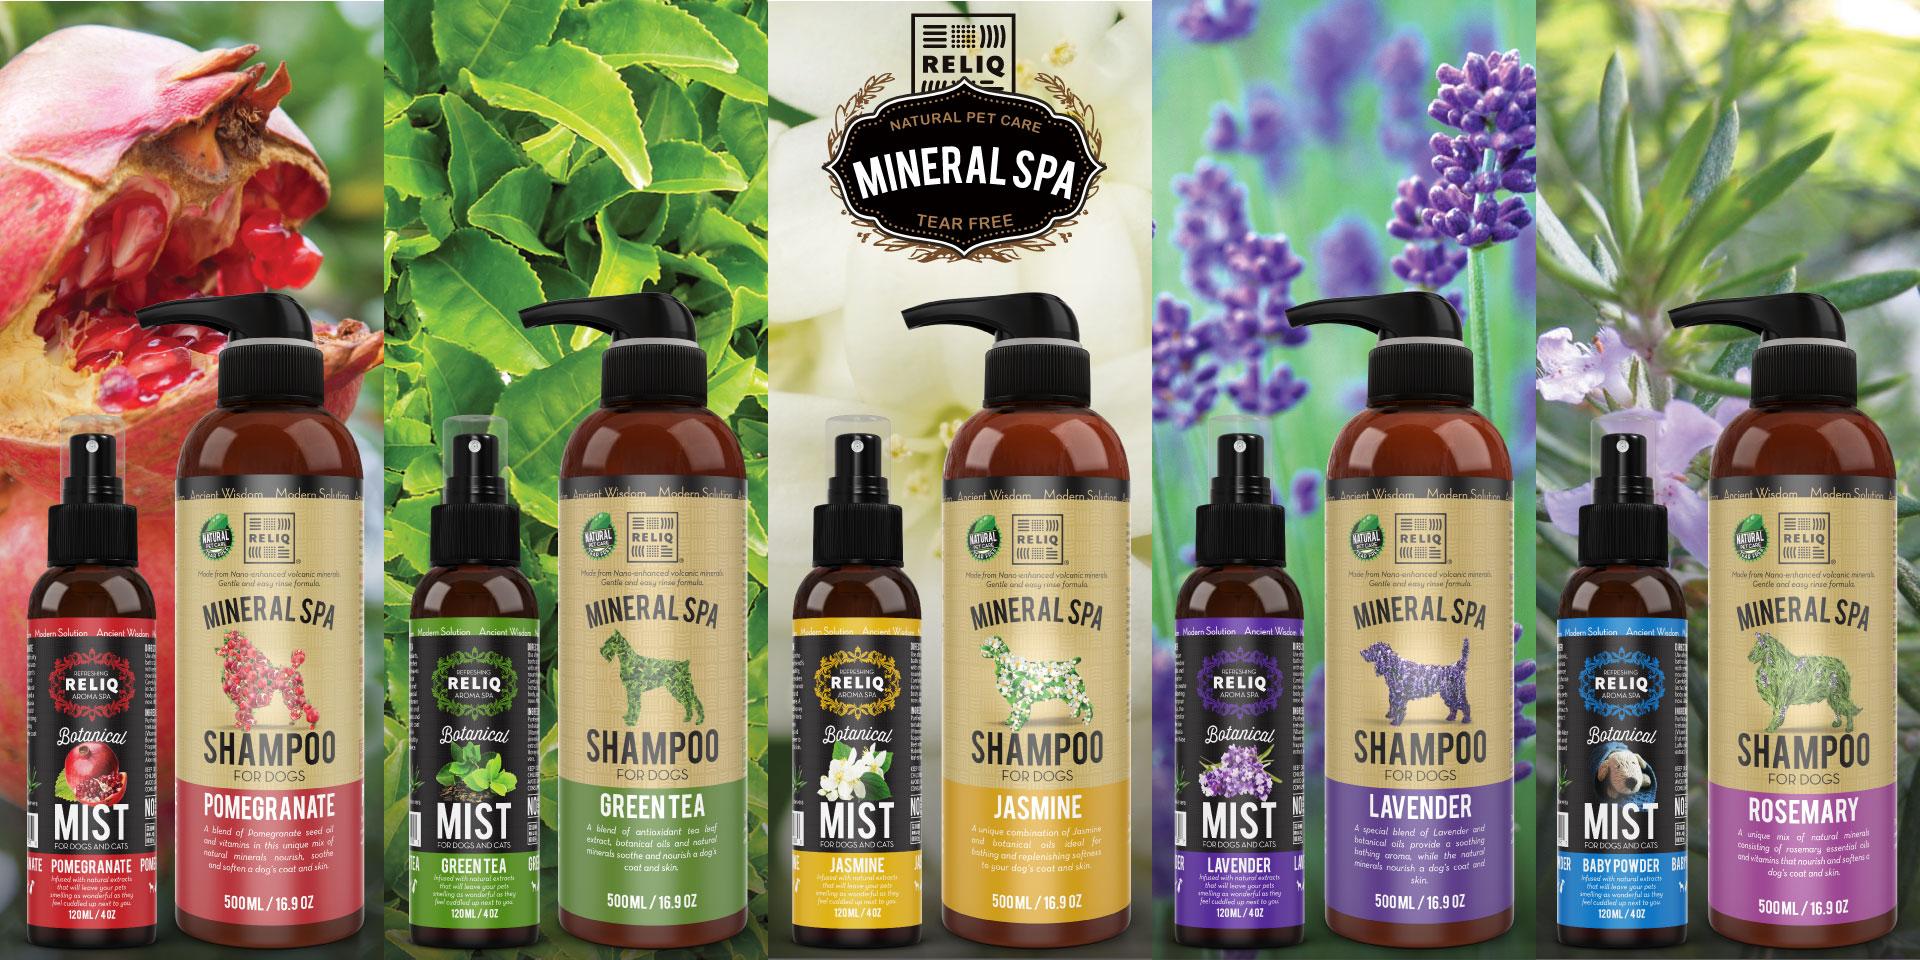 RELIQ mineral spa shampoo